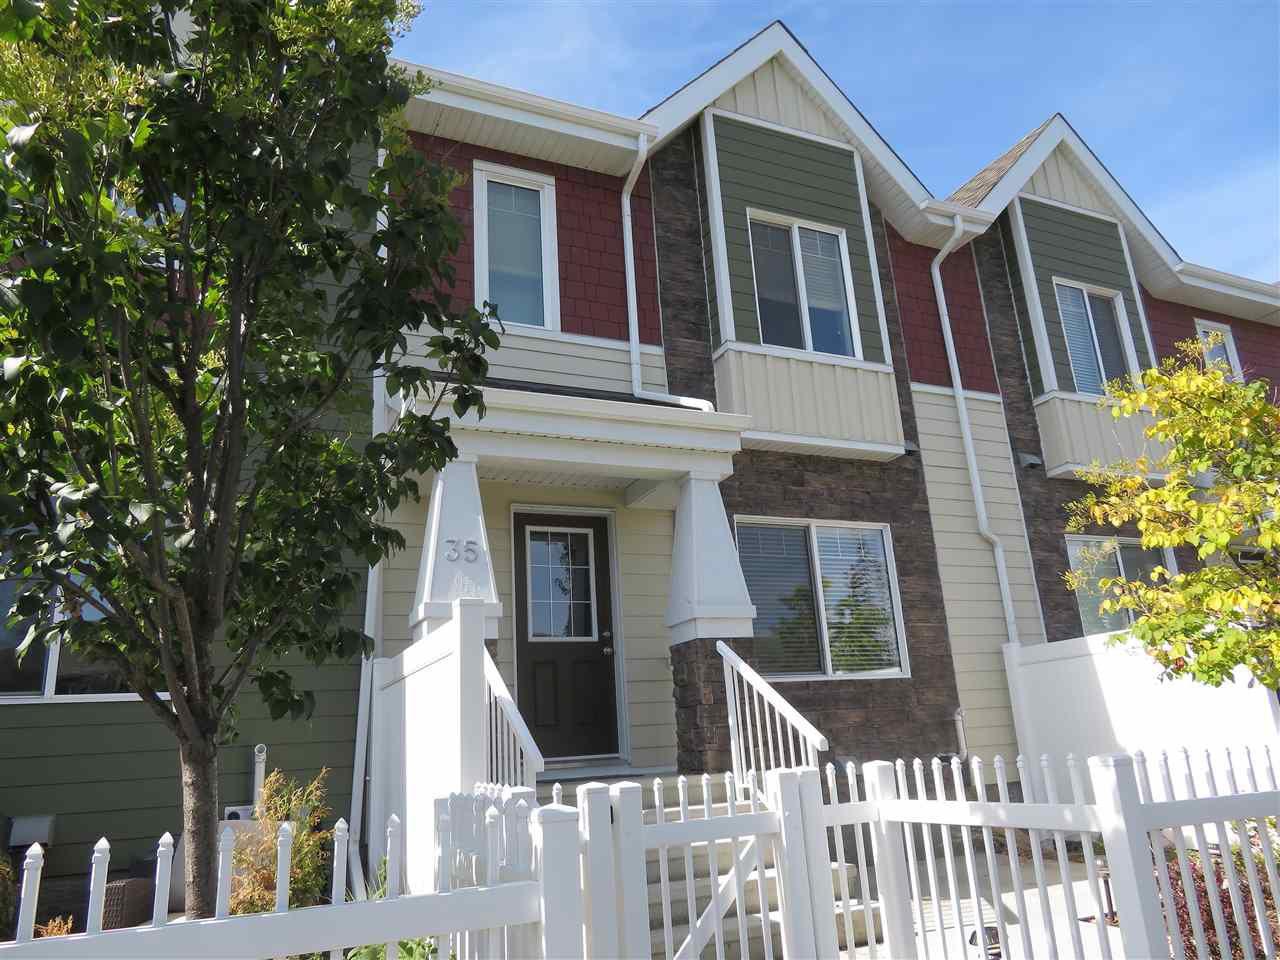 Main Photo: 35 2003 RABBIT HILL Road in Edmonton: Zone 14 Townhouse for sale : MLS®# E4128154